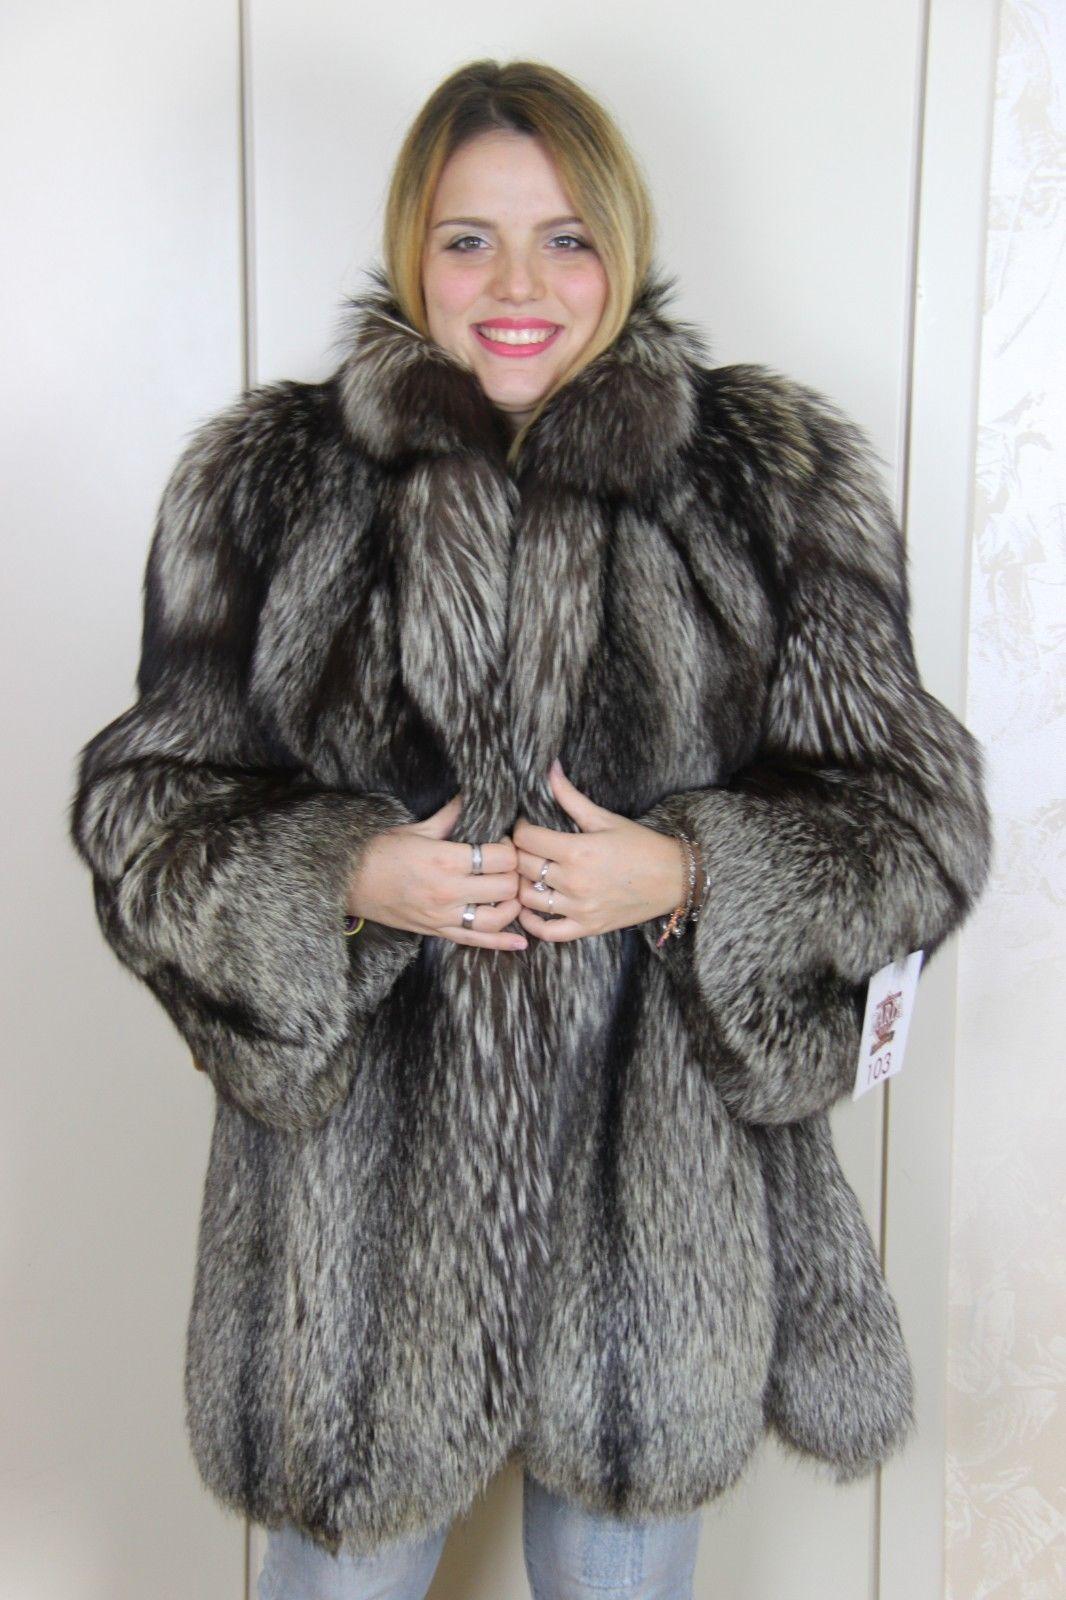 half off bc5cd d963f Details about Mink Coat Hooded Fox Pelliccia Visone Fuchs ...